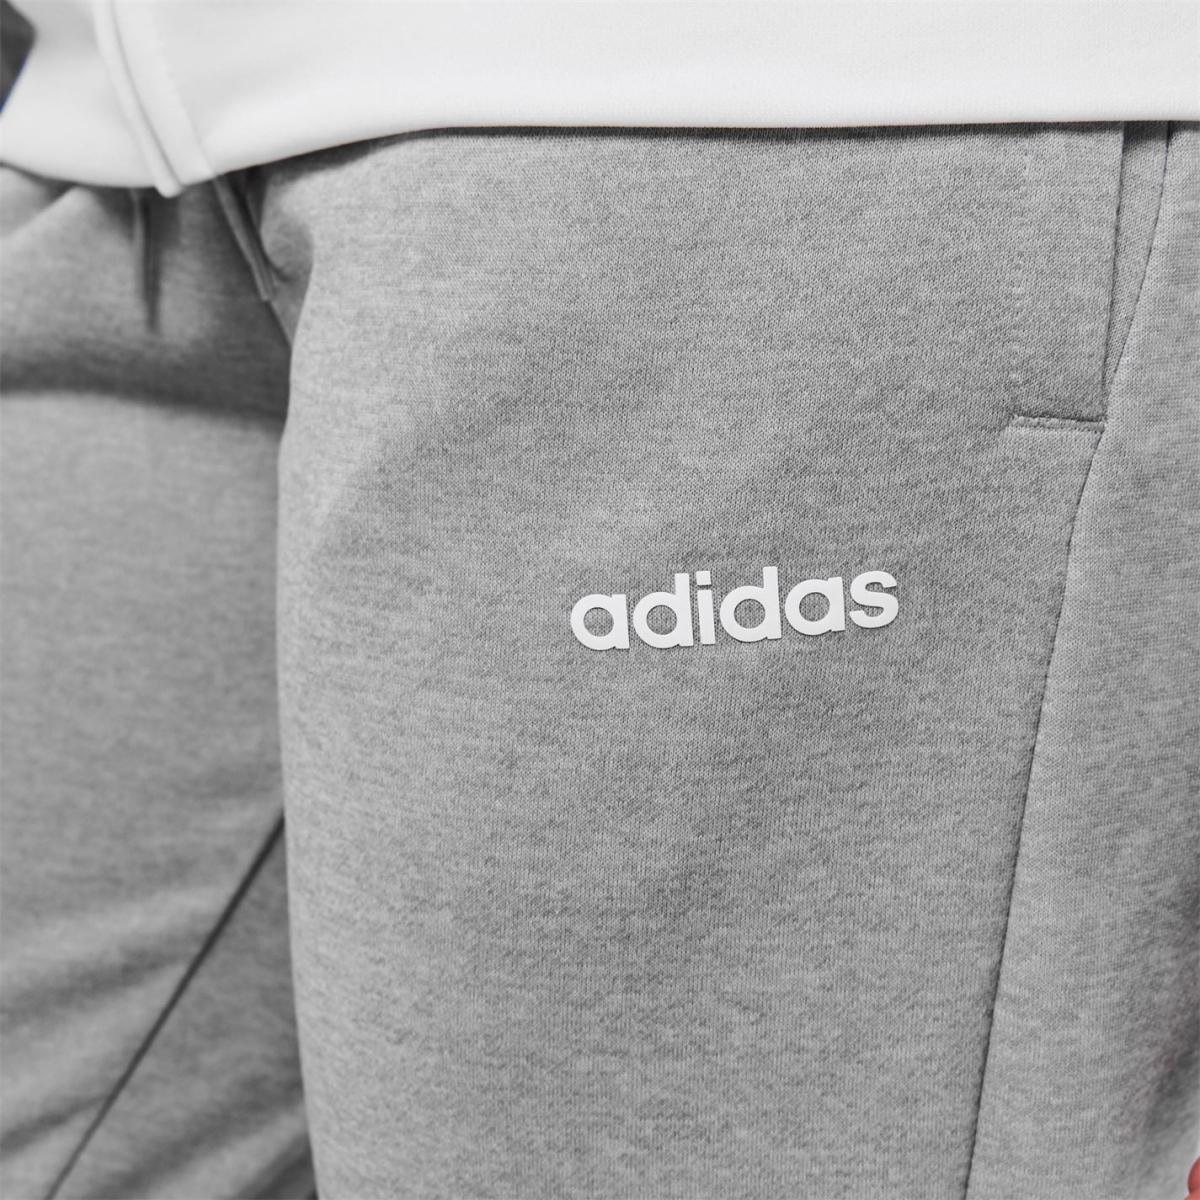 Details zu adidas Linear Trainingsanzug Sportanzug Damen Jogginganzug Tracksuit 7324